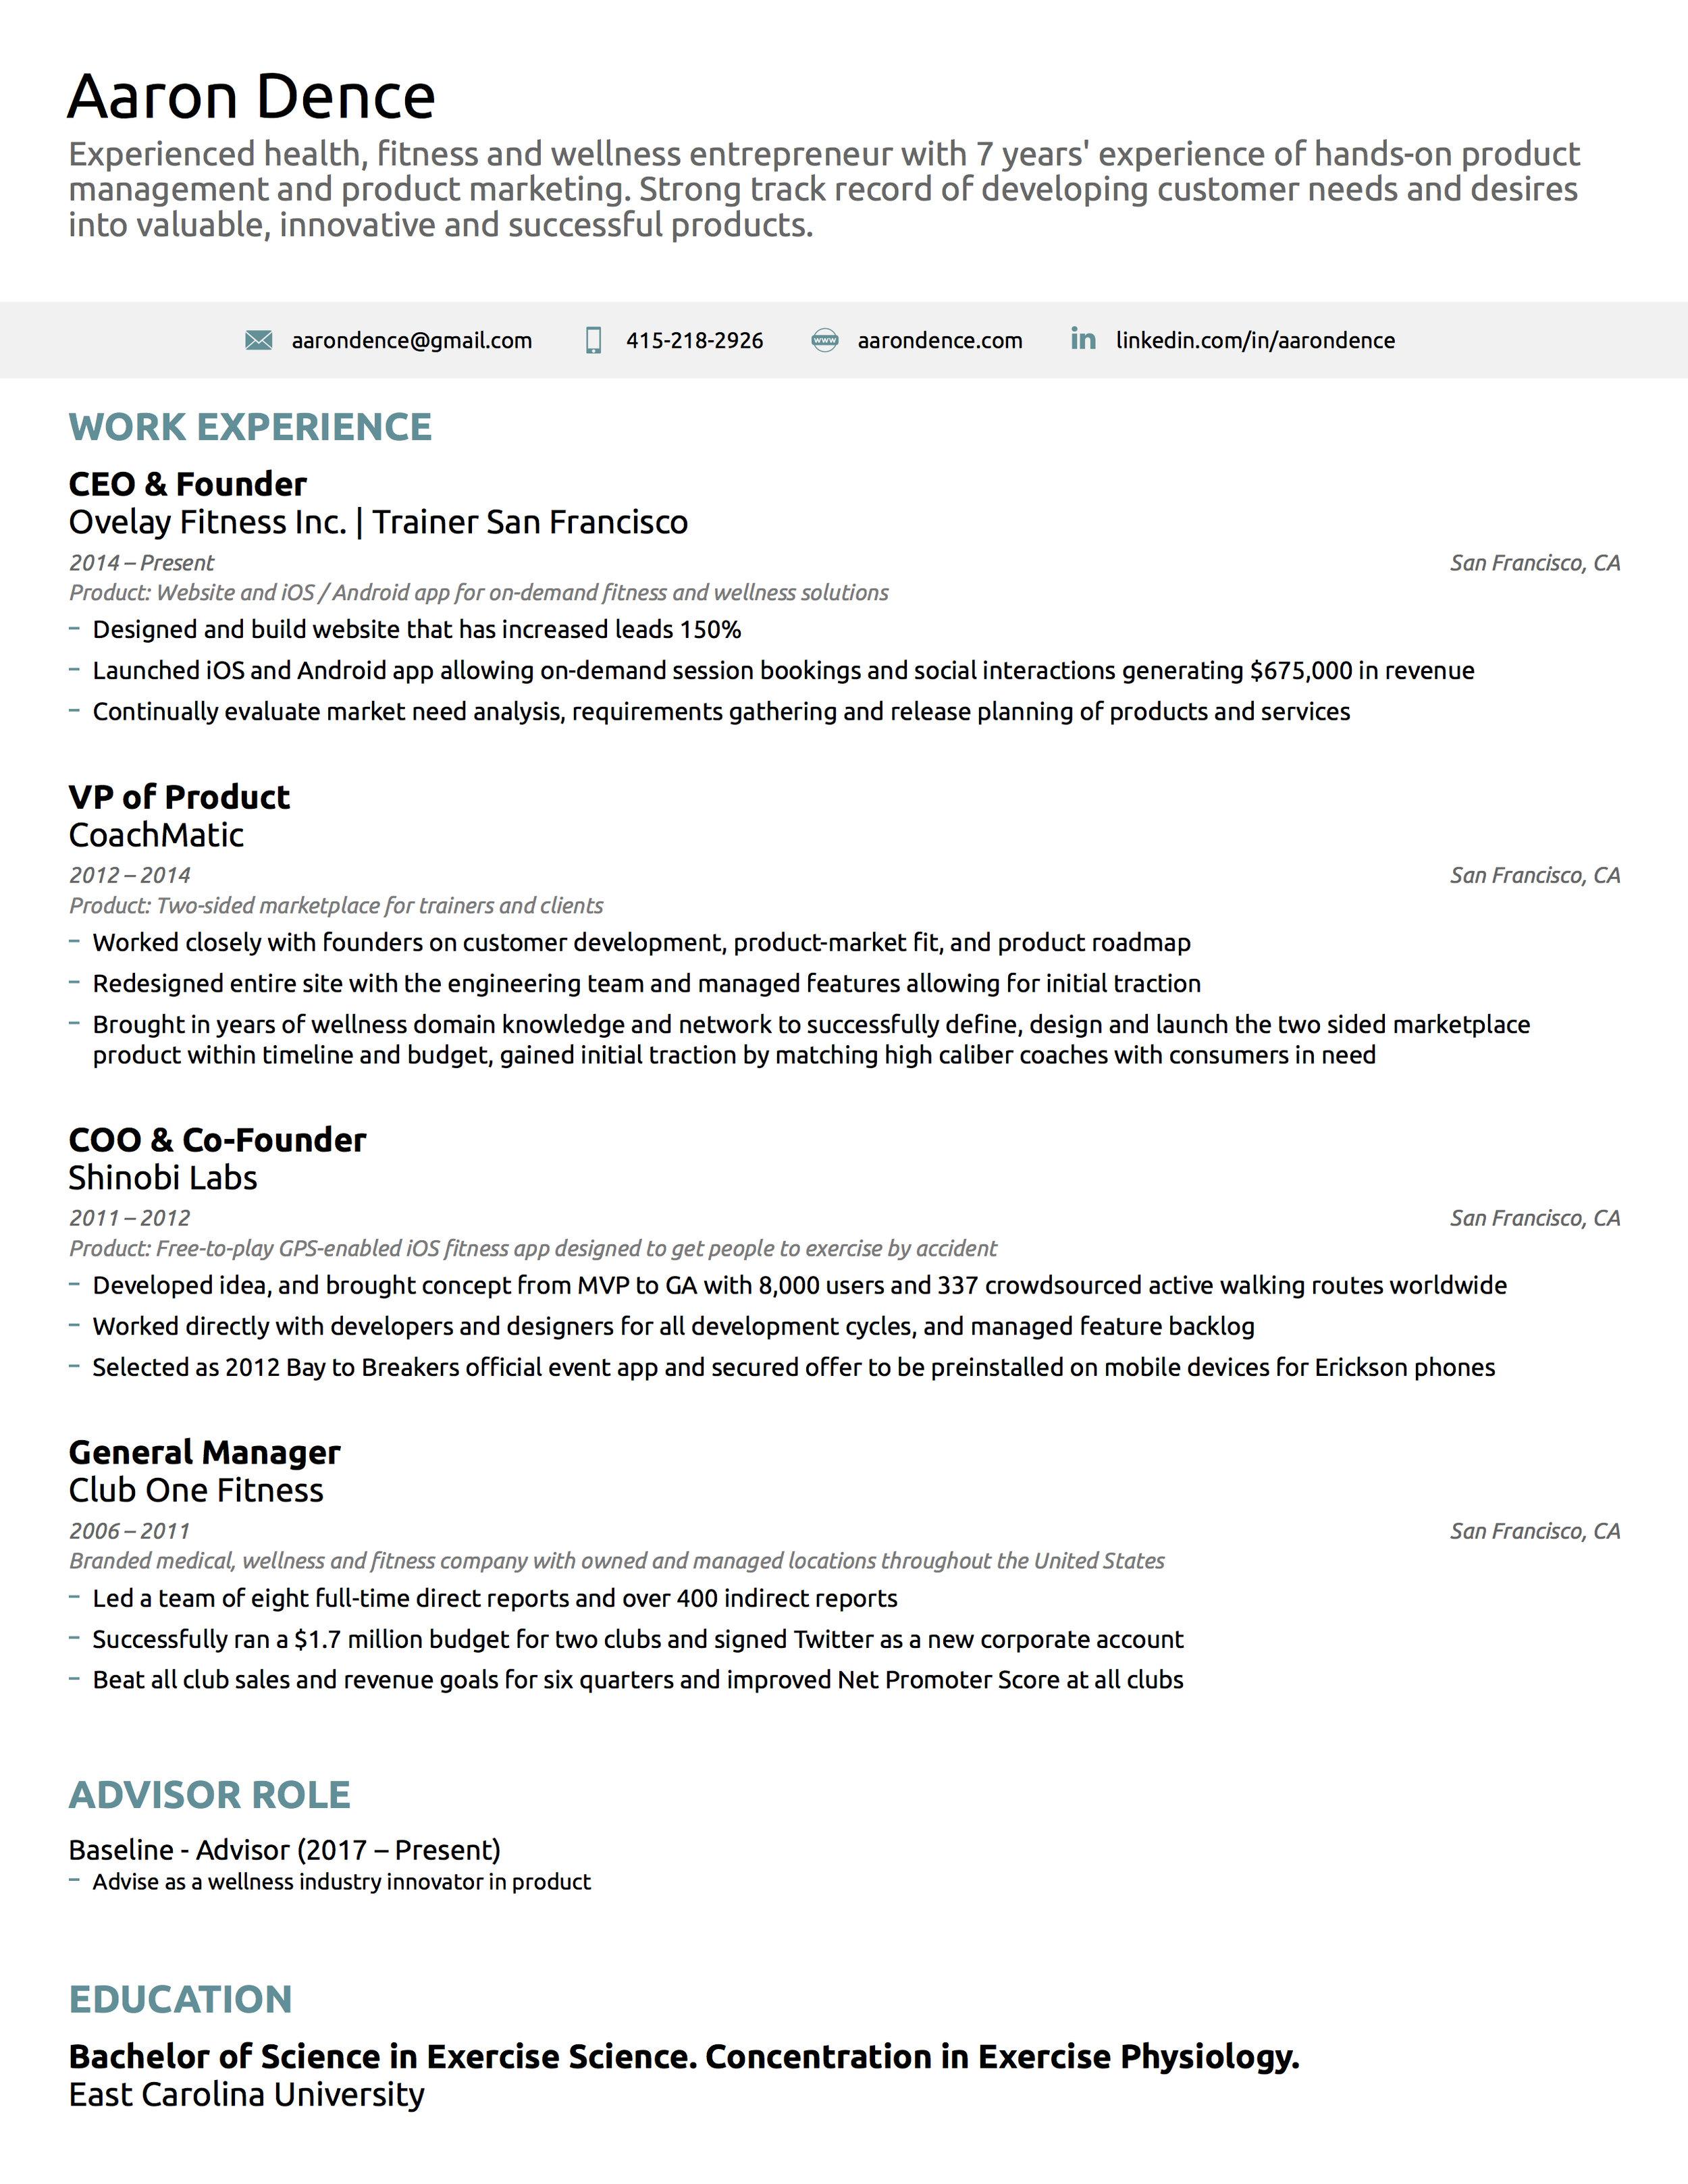 Aaron's Resume (3).jpg